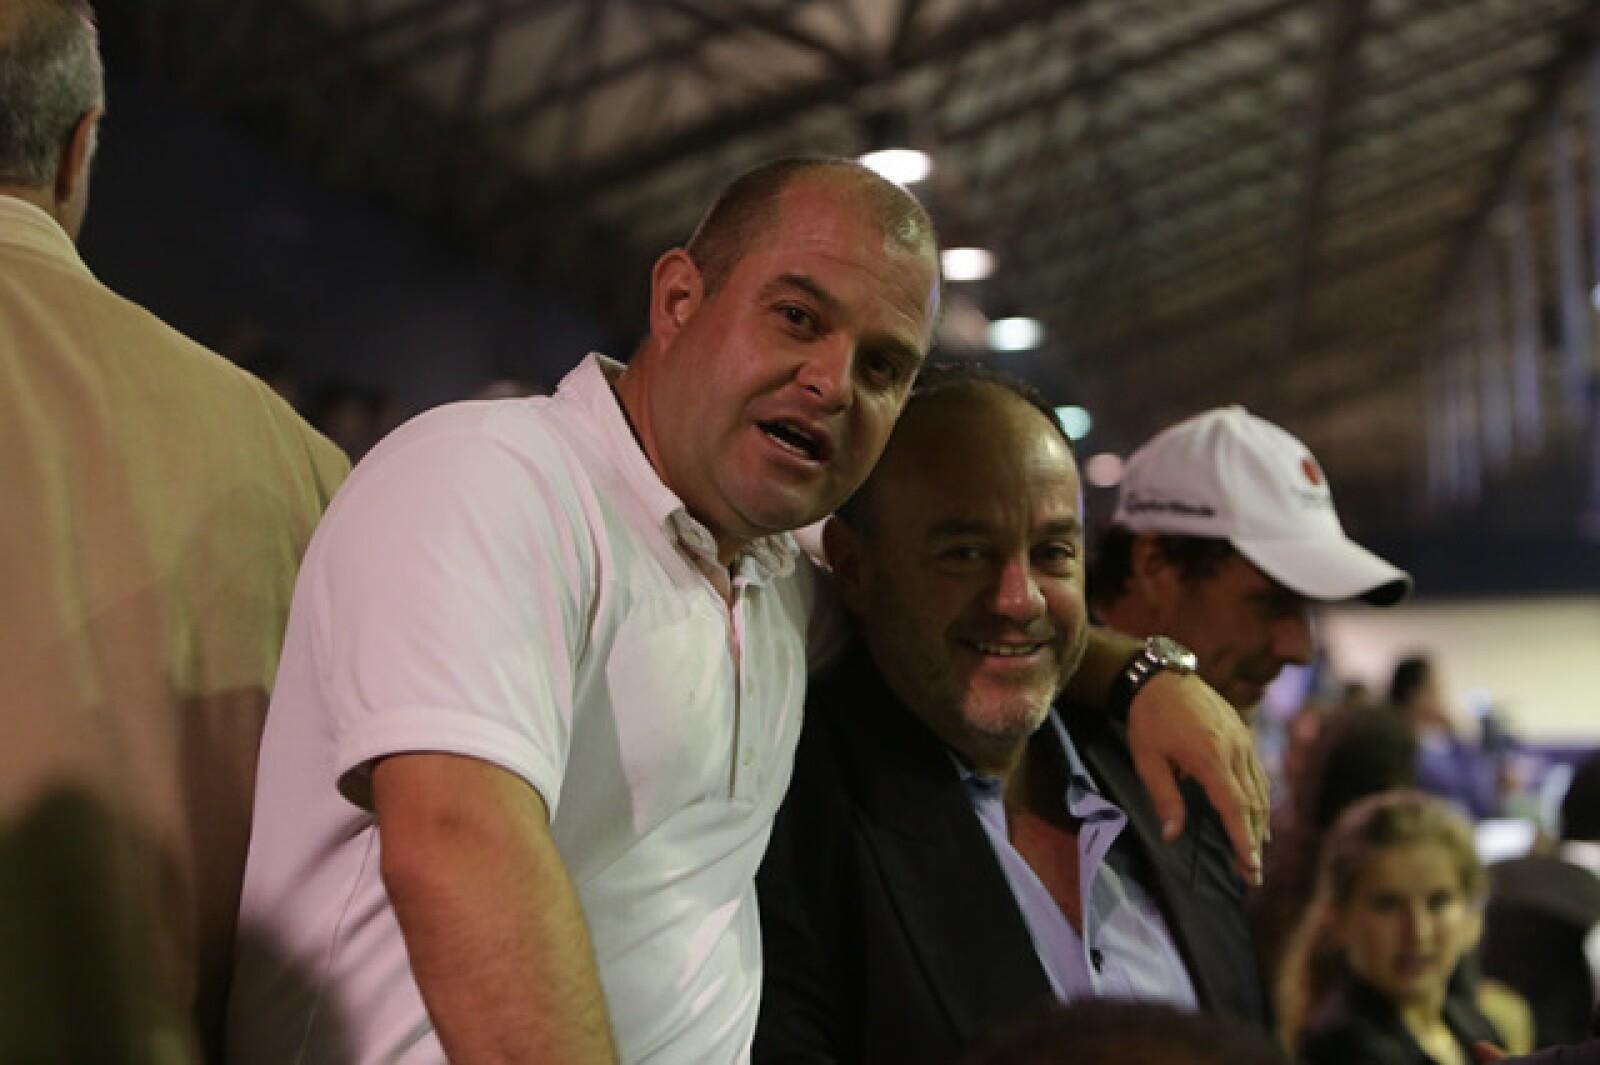 Mauricio Becker y Juán Manuel Riego